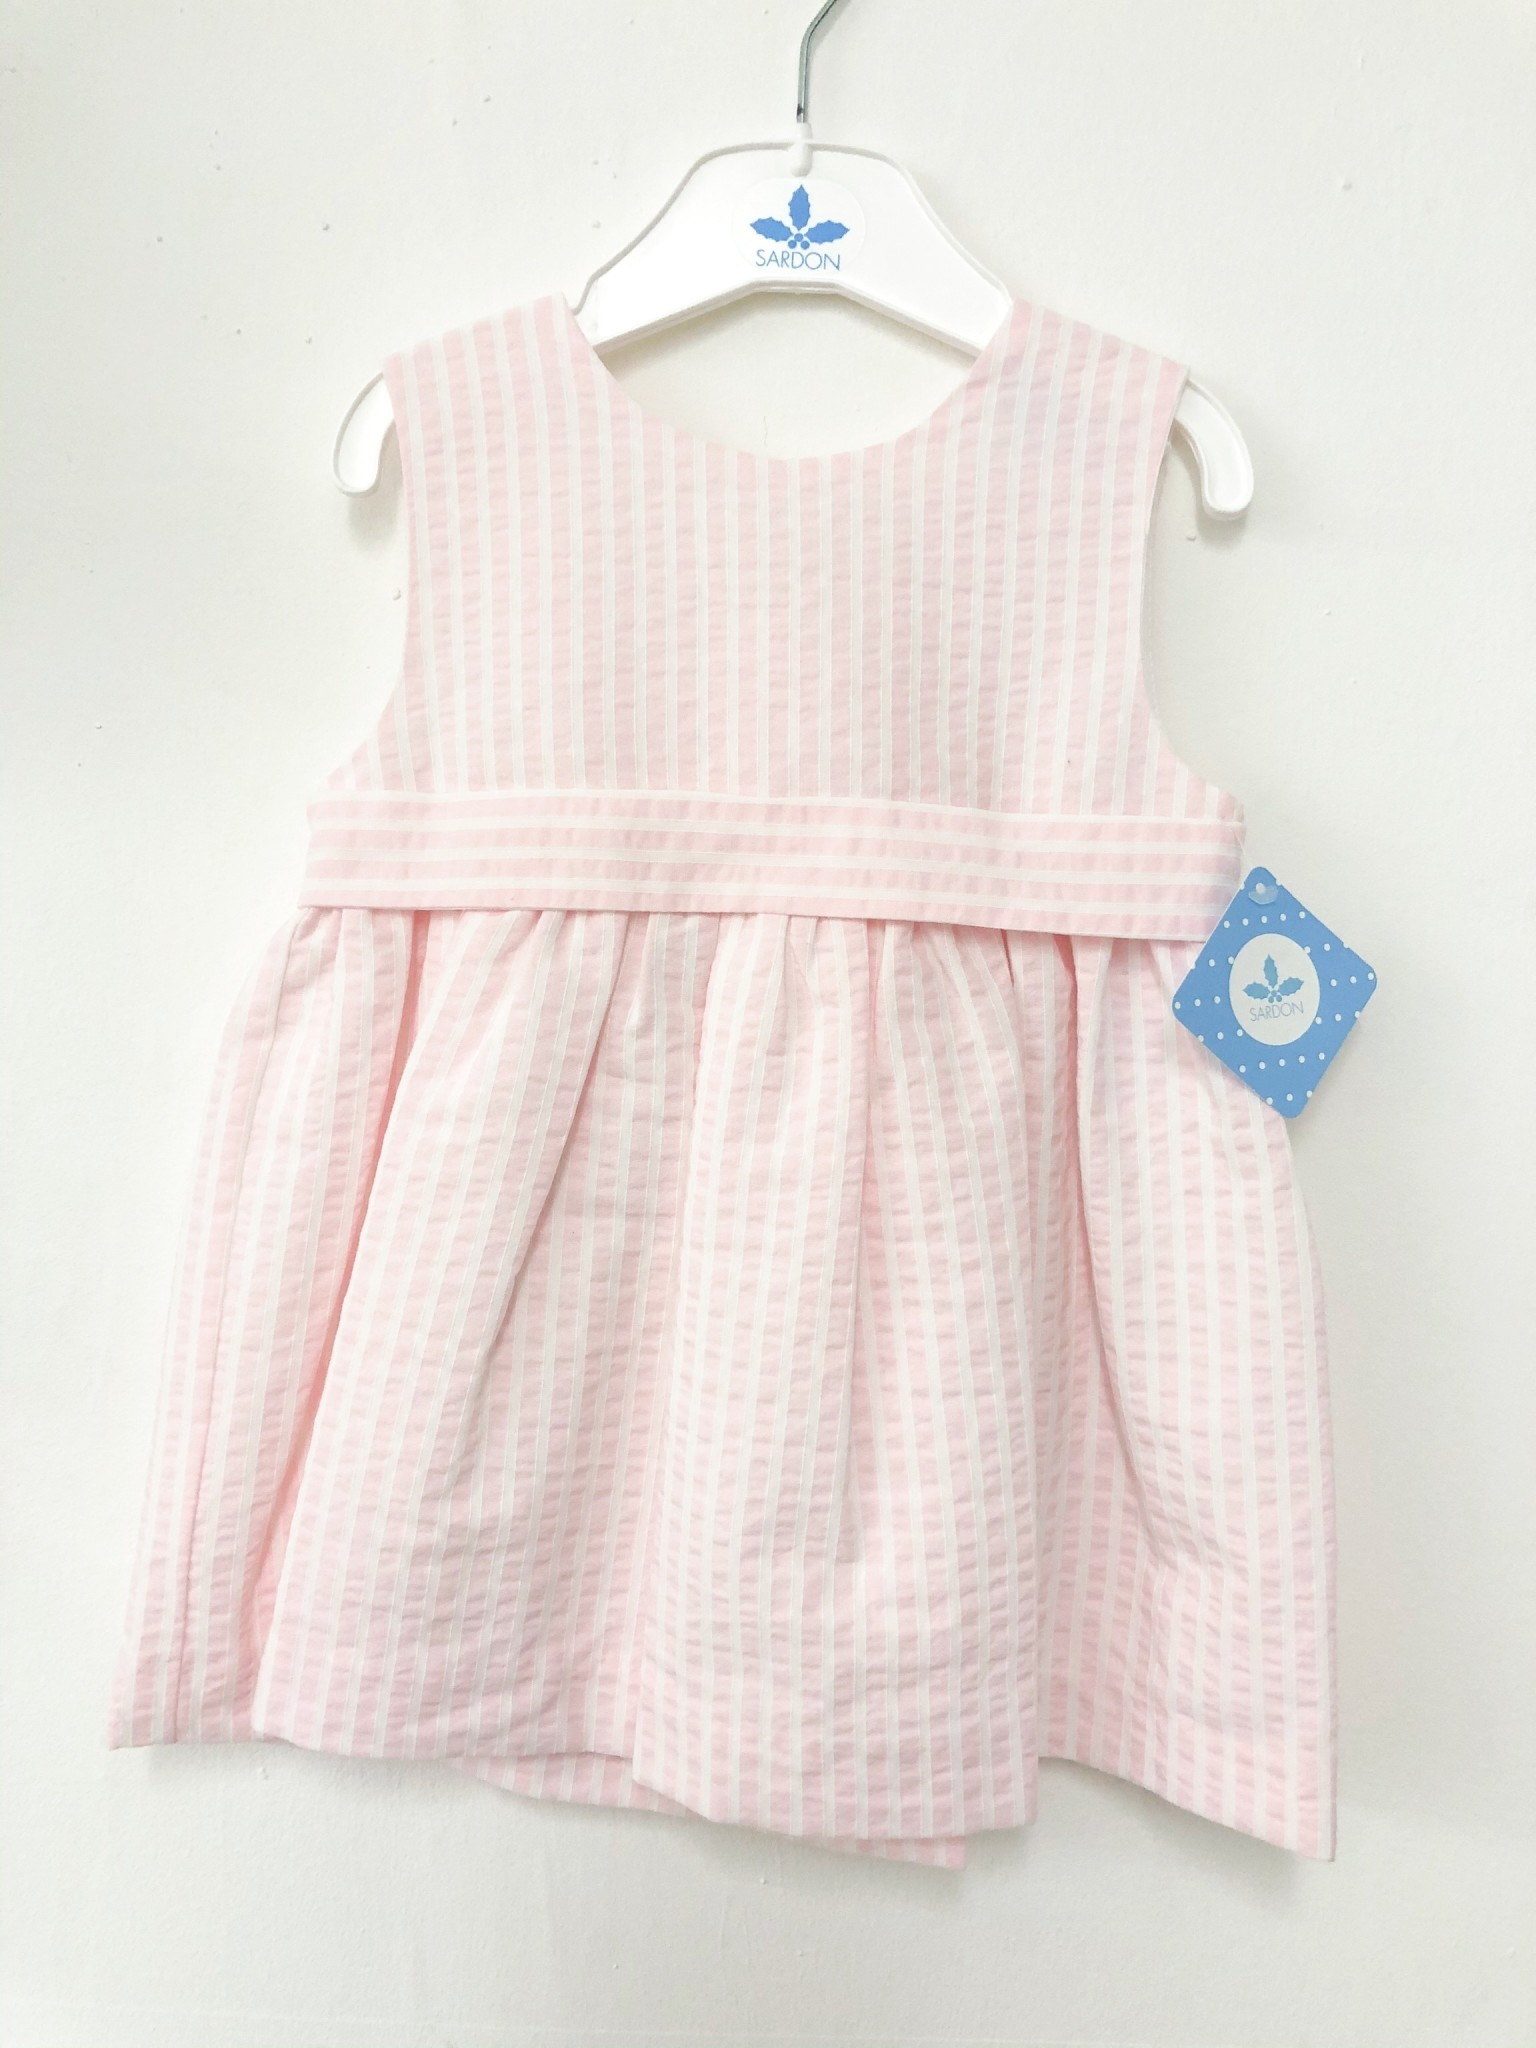 Sardon Sardon 20AB-15 Pink/White Stripe Dress